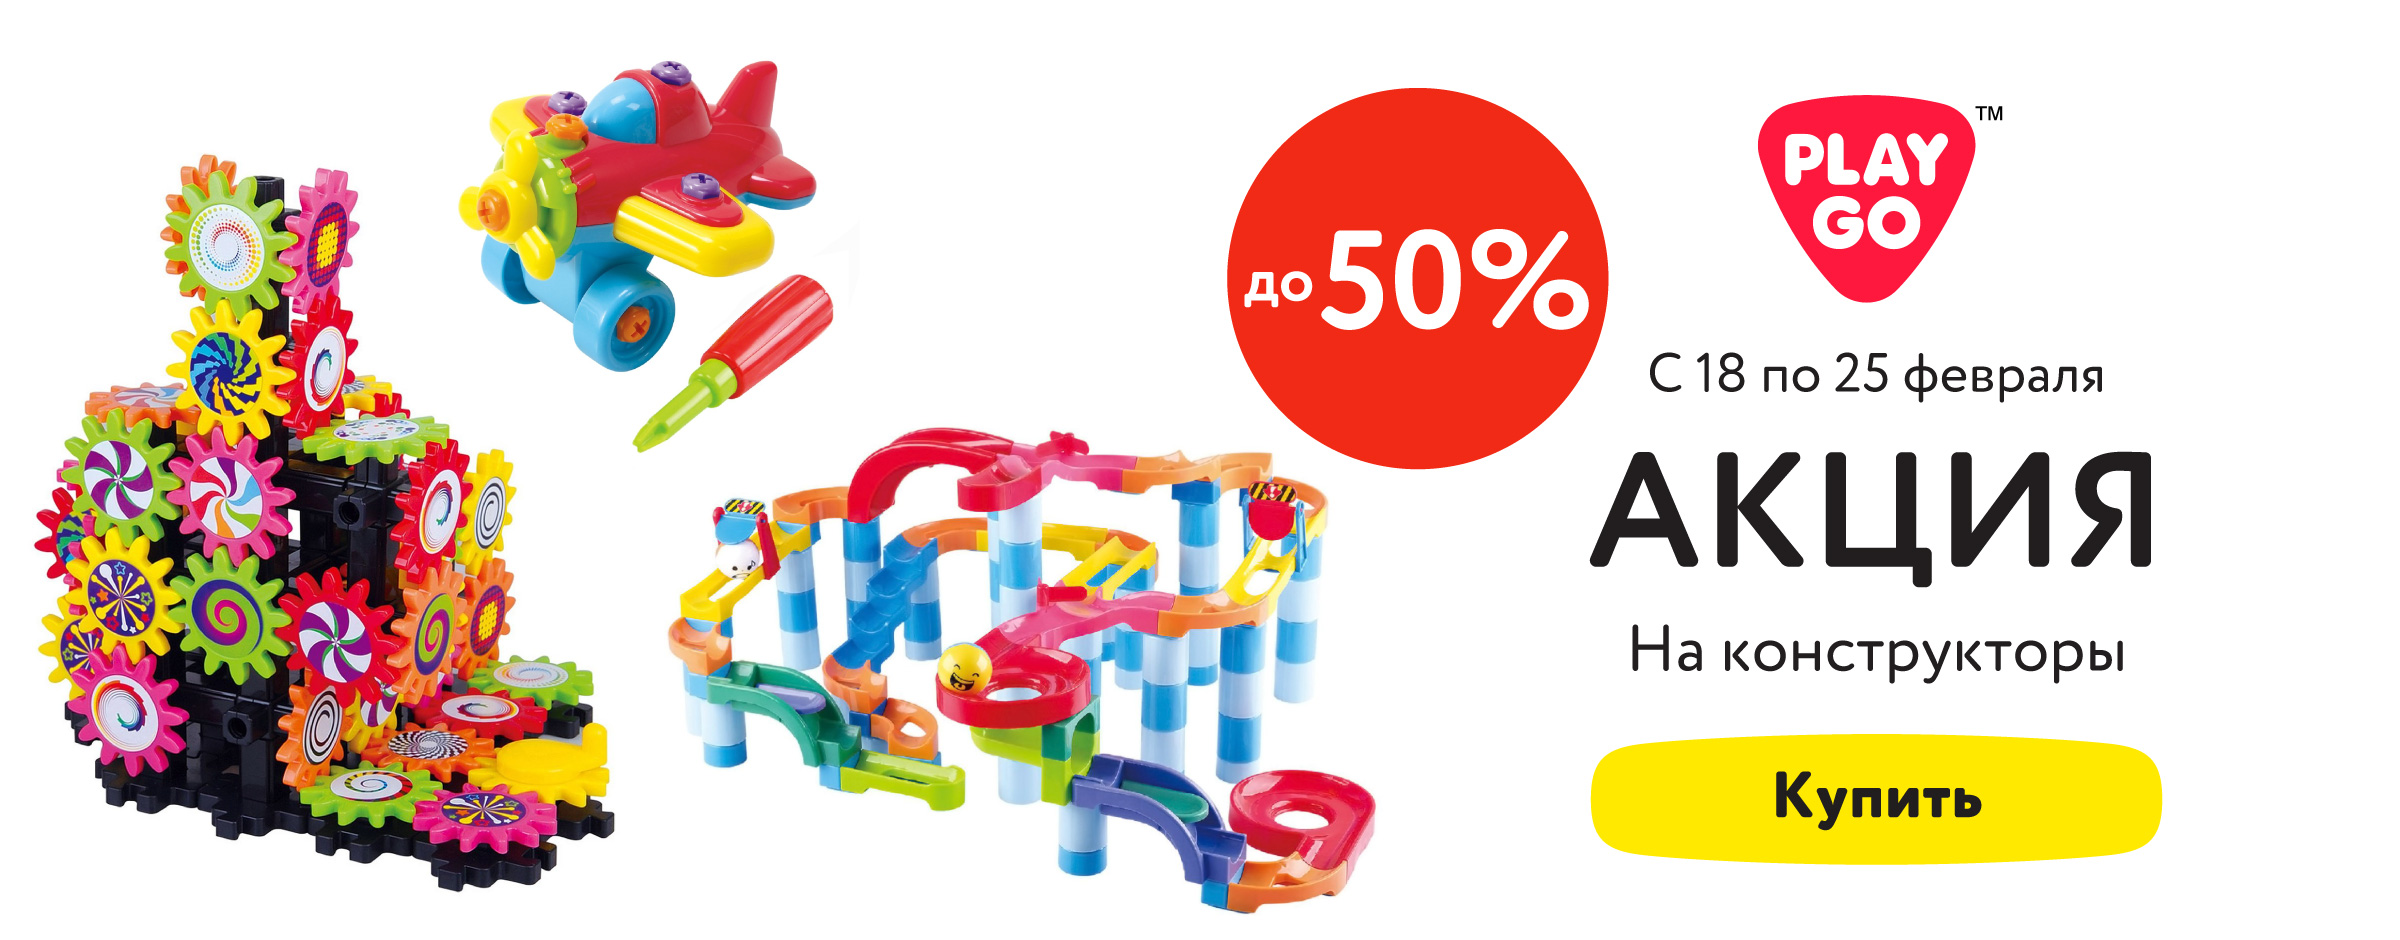 До 50% на конструкторы Playgo